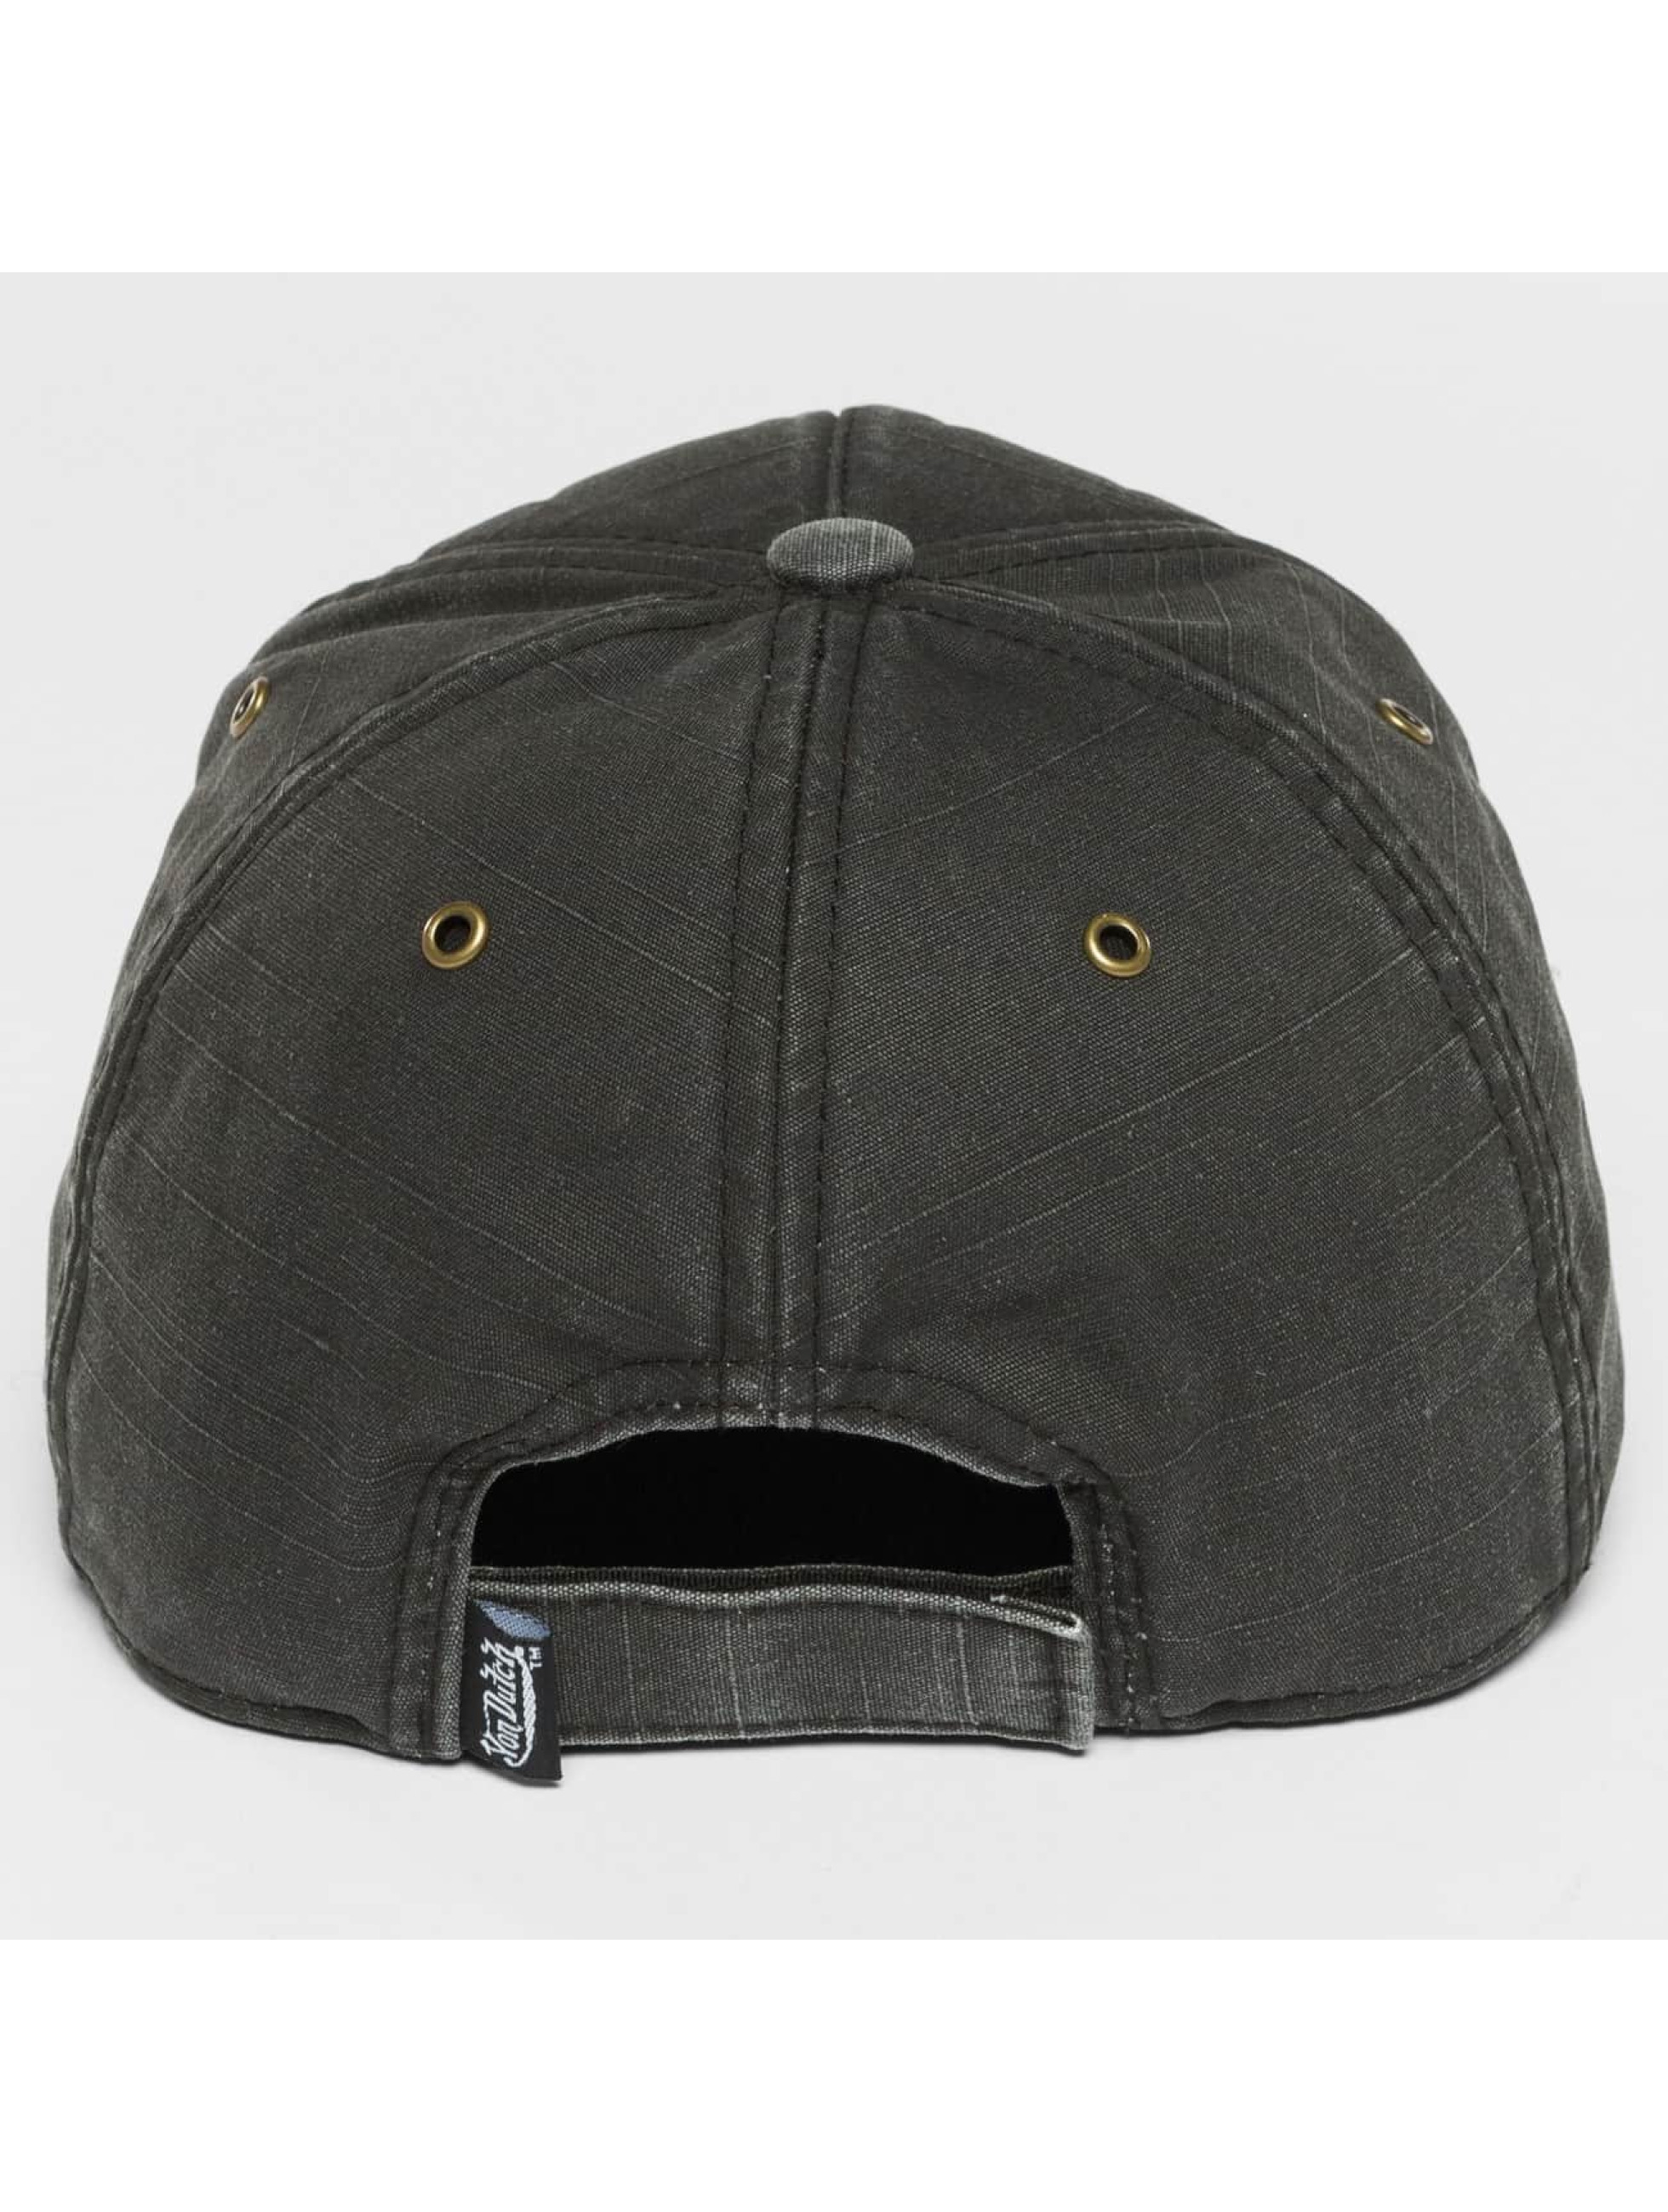 Von Dutch Gorra Snapback Velcro negro